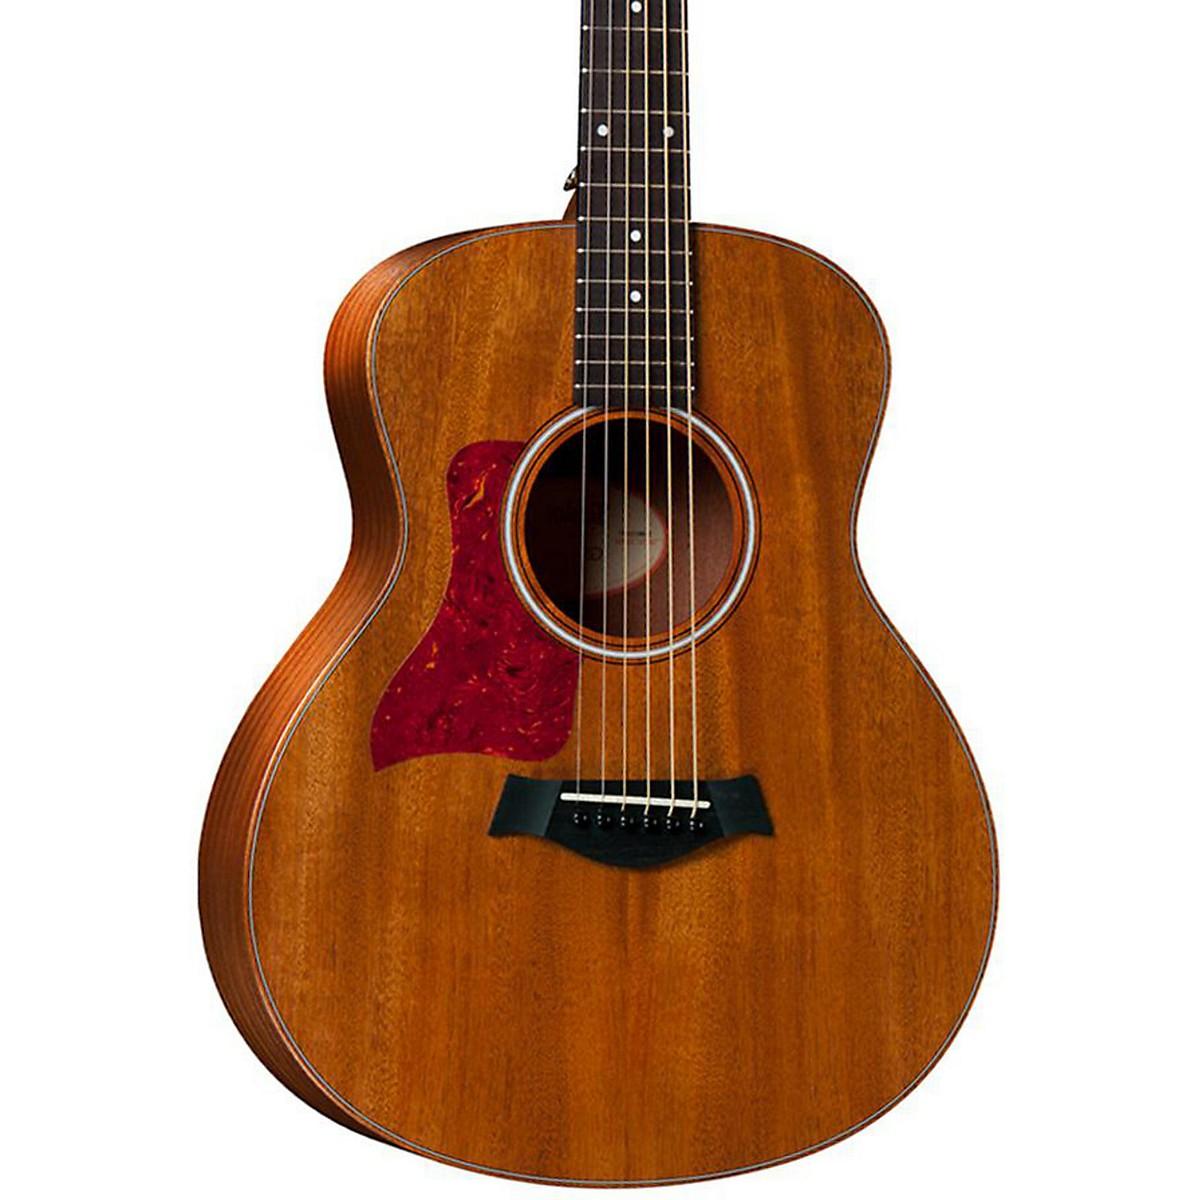 Taylor GS Mini Mahogany Left-Handed Acoustic Guitar